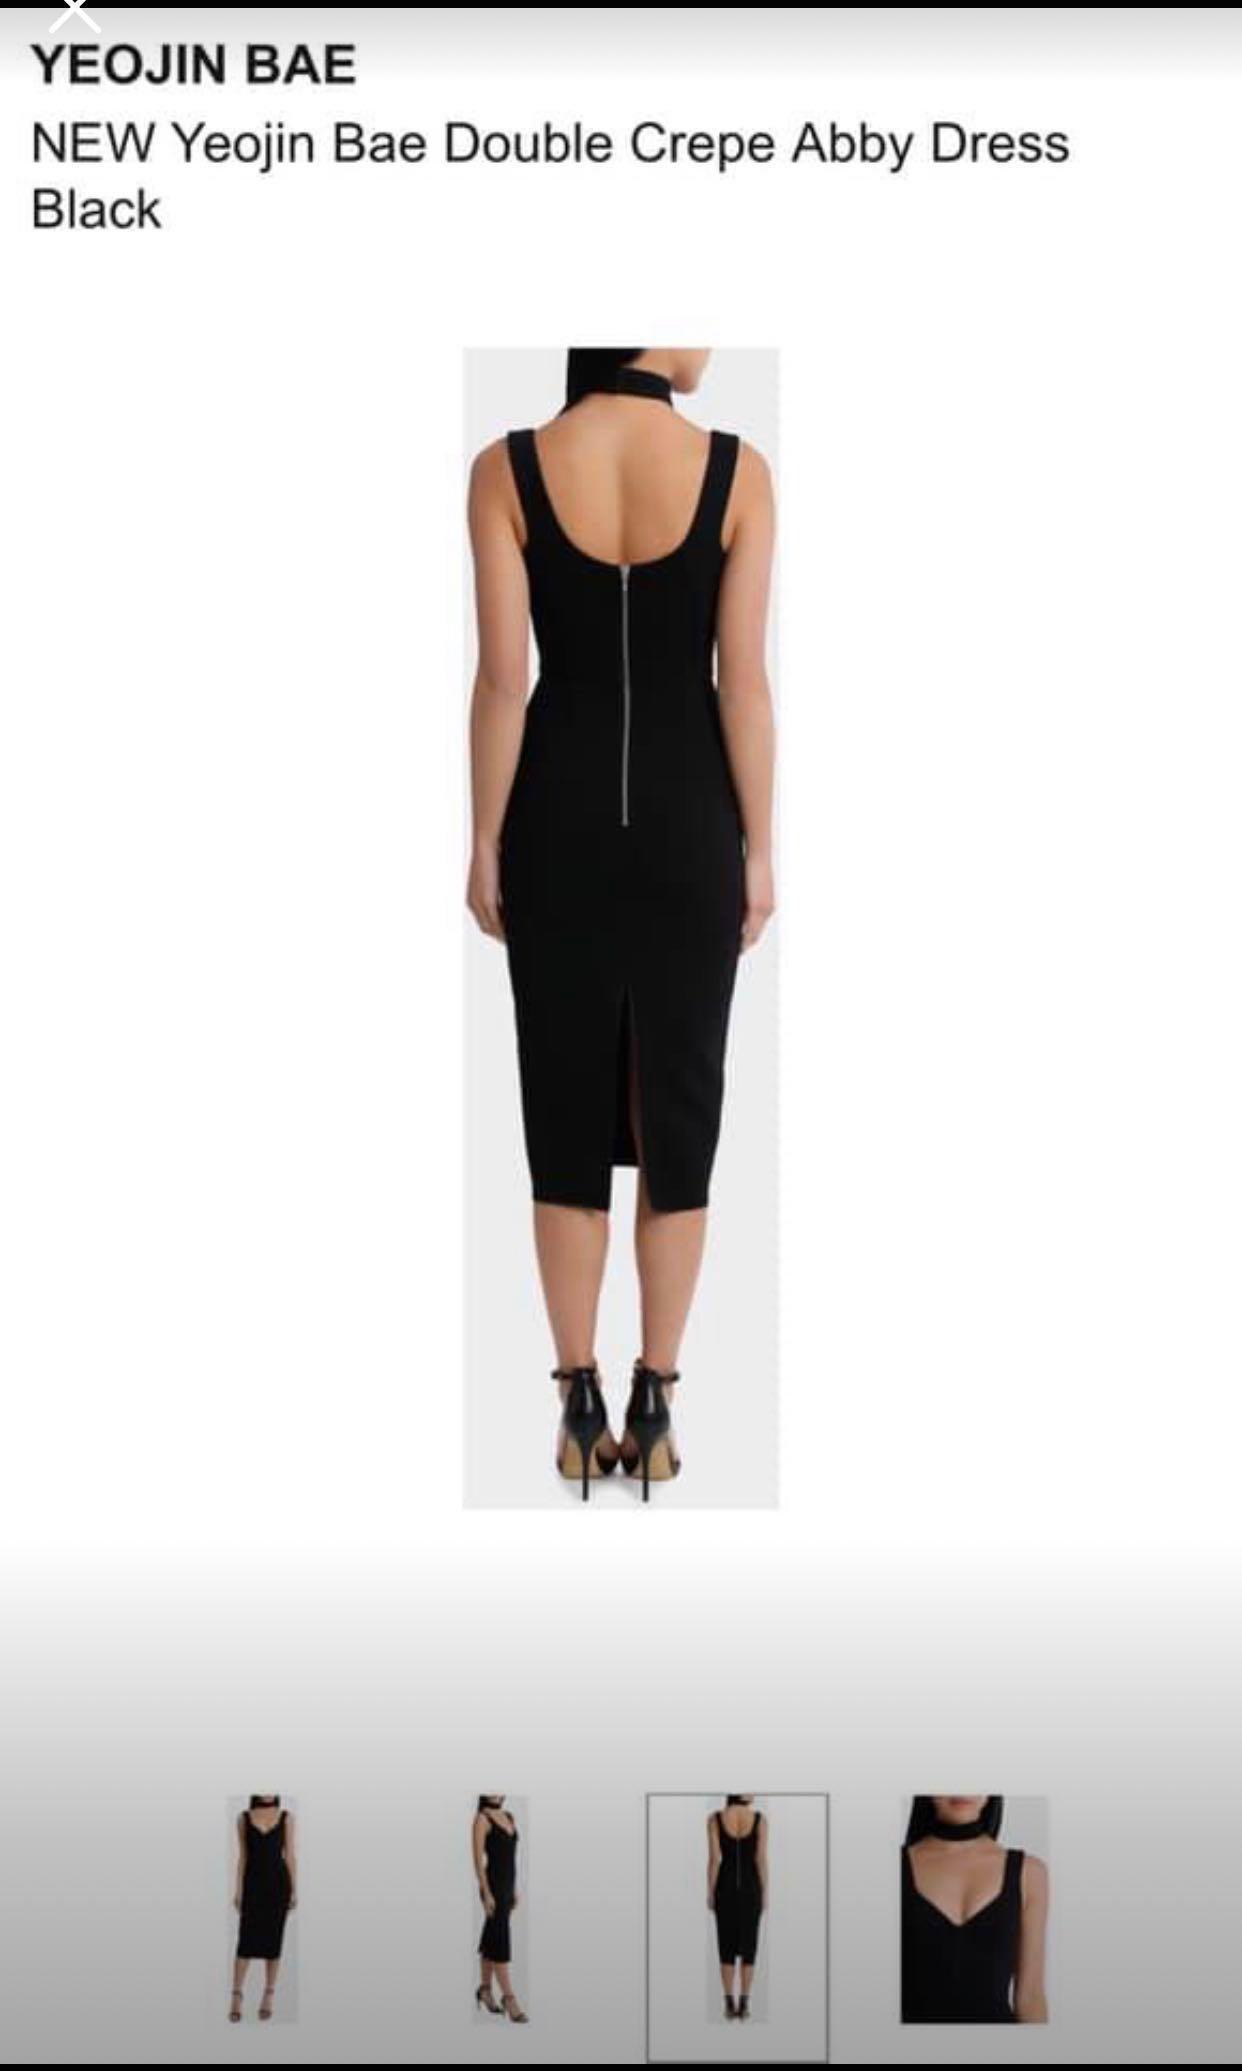 BRAND NEW Yeojin Bae Double Crepe Abby Dress in Black RRP$675